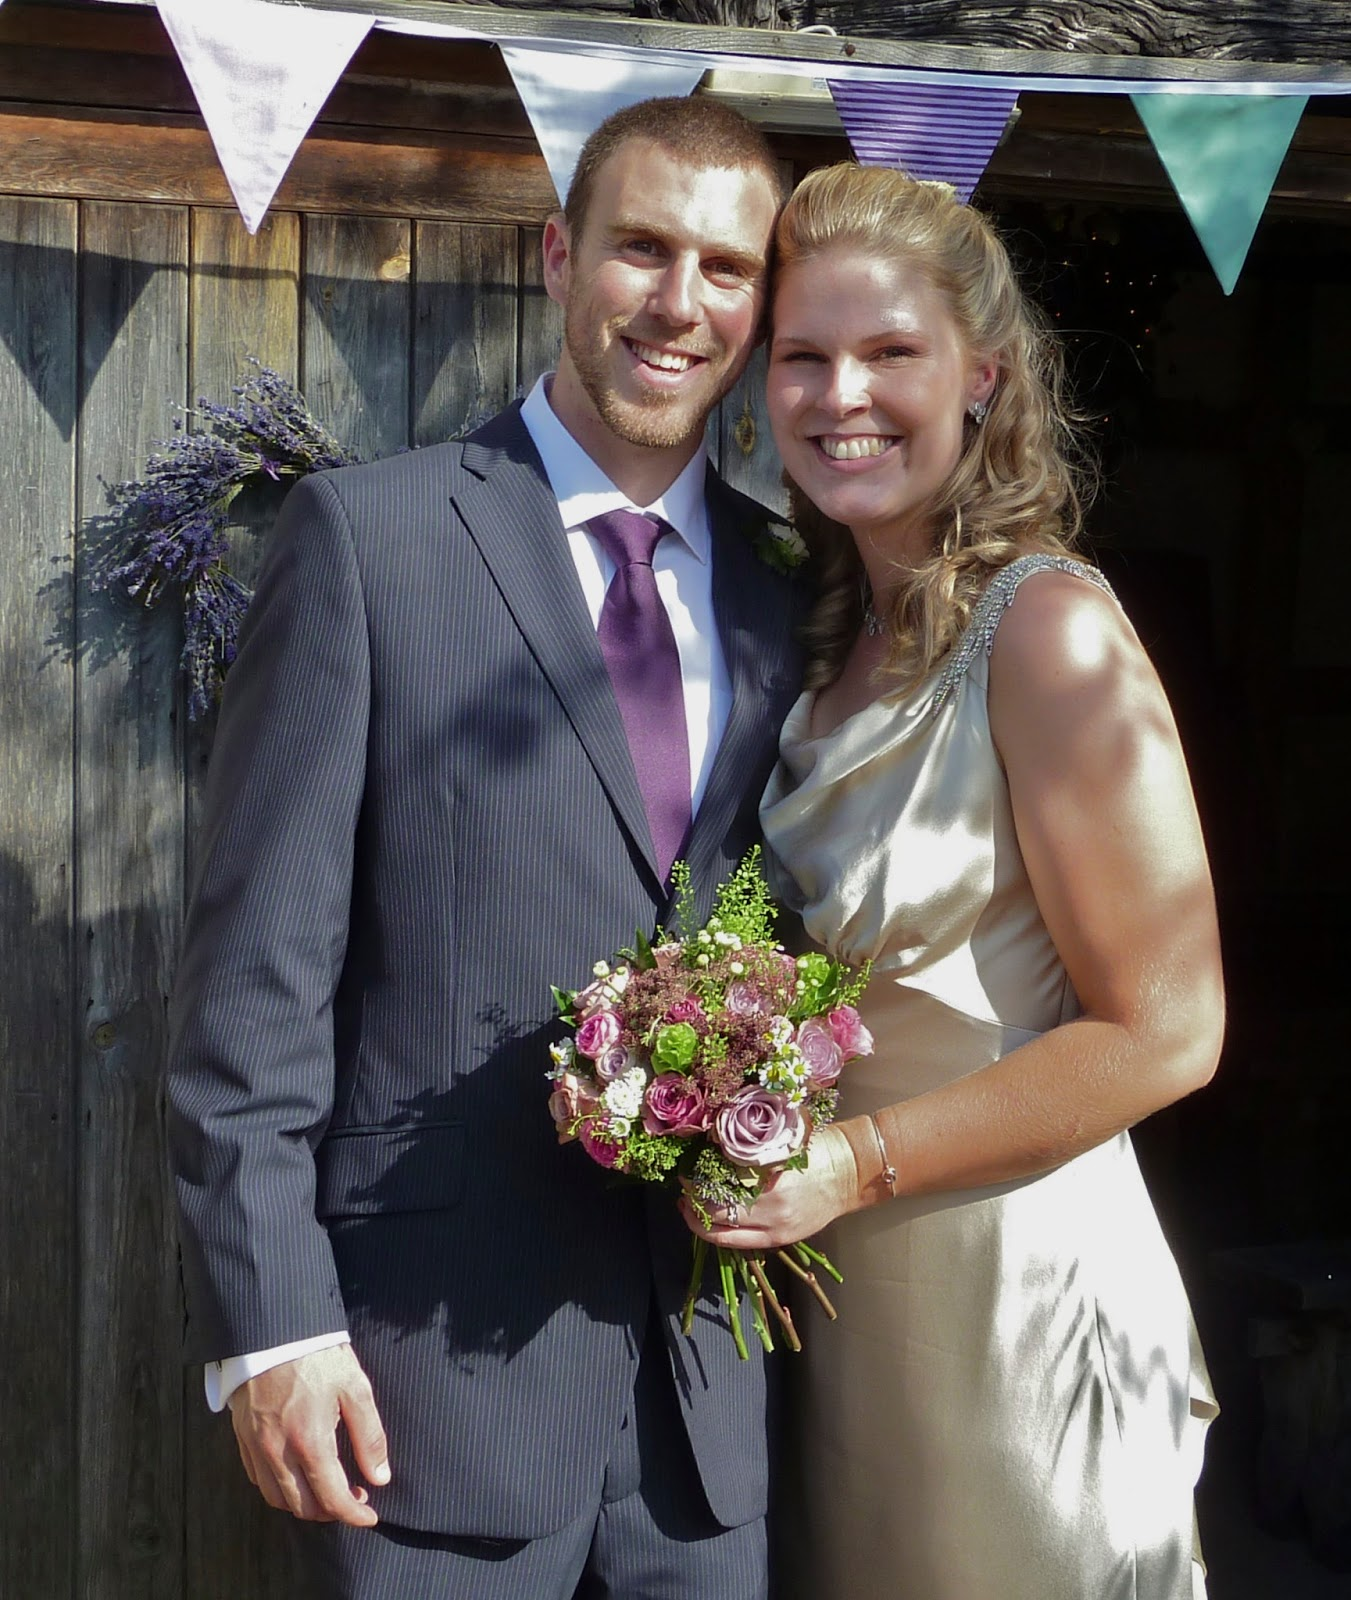 Wedding Flowers Warwickshire: September Wedding Flowers, Cotswold Wedding Flowers And